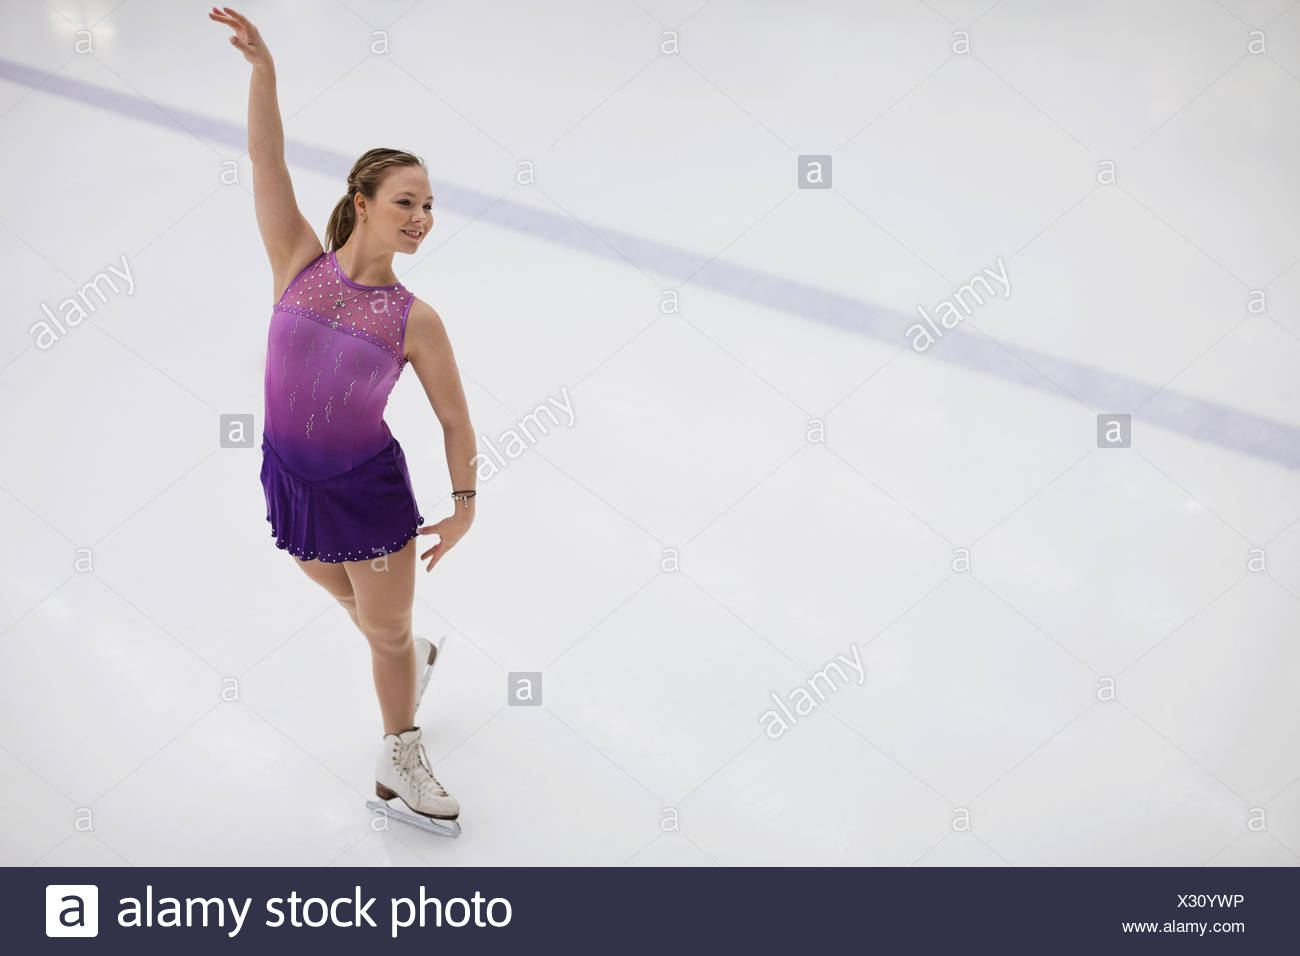 Figura femenina skater realizando la rutina en una pista de patinaje Foto de stock